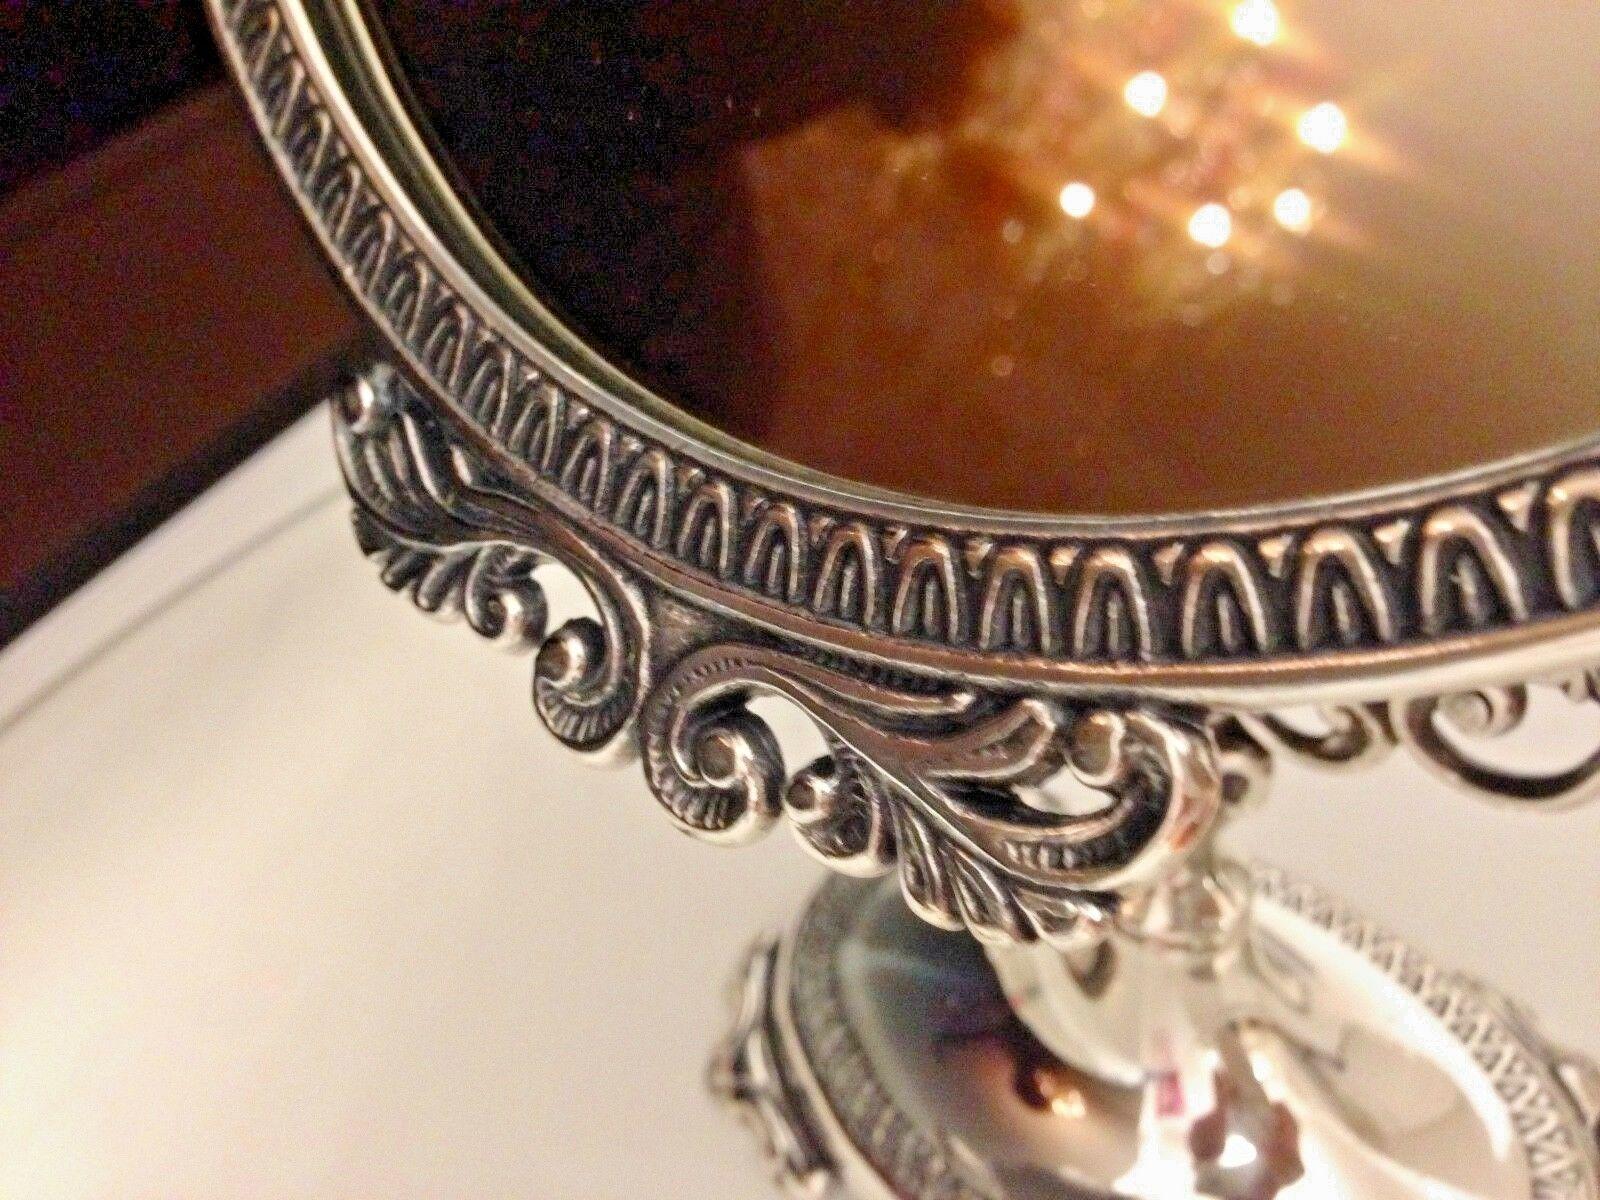 Standspiegel Silber MESSING Schminkspiegel Kippspiegel Antik schwenk ...